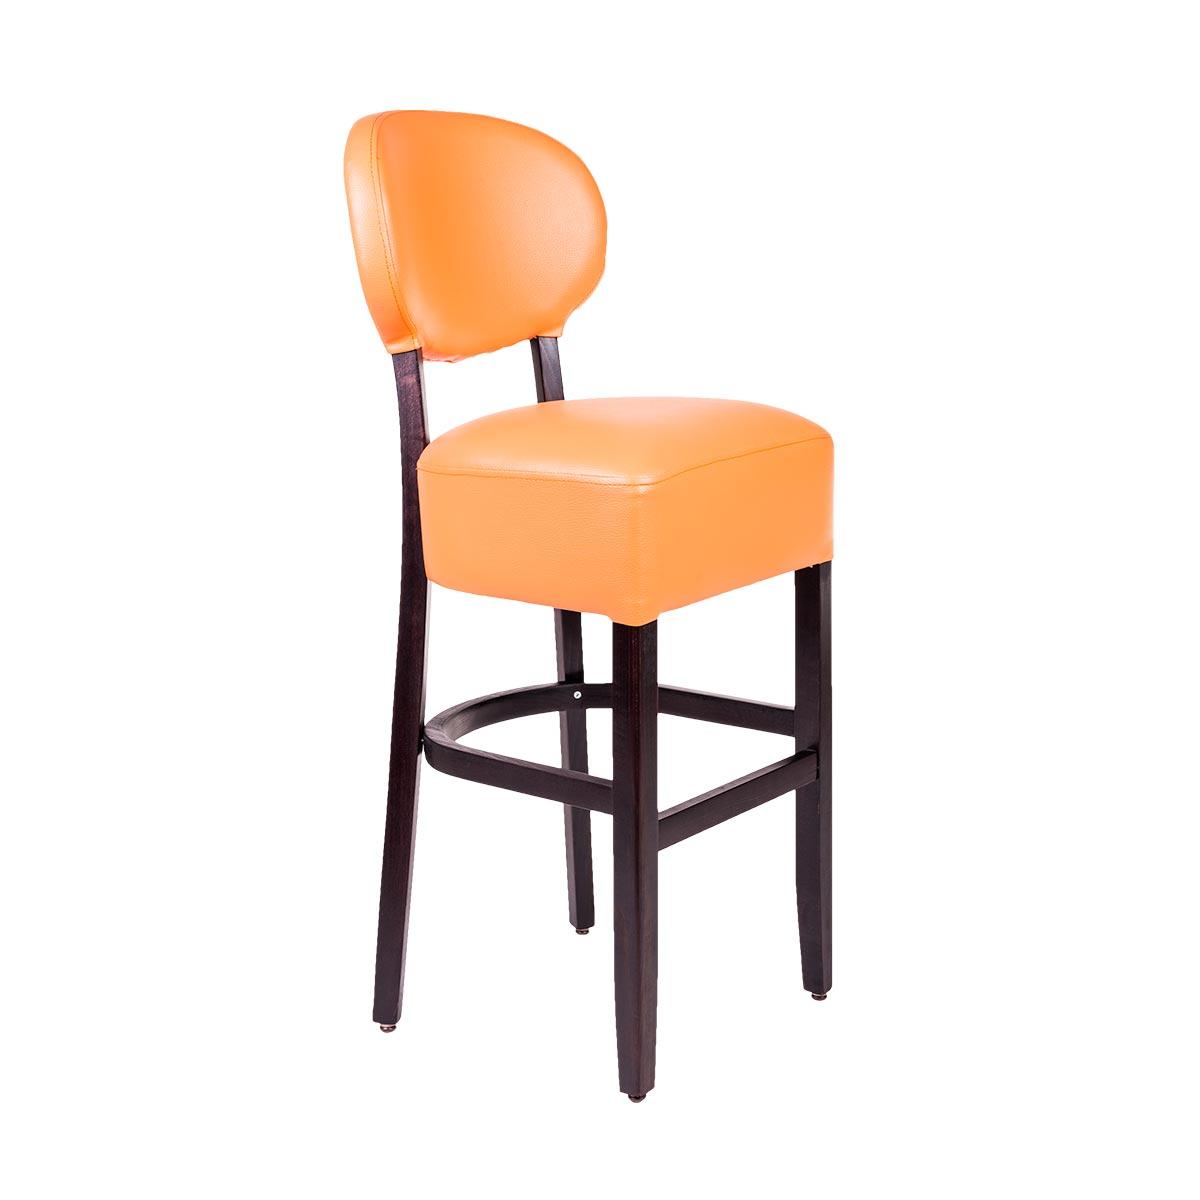 Barska stolica Lisa Round Bar - Detal barske stolice